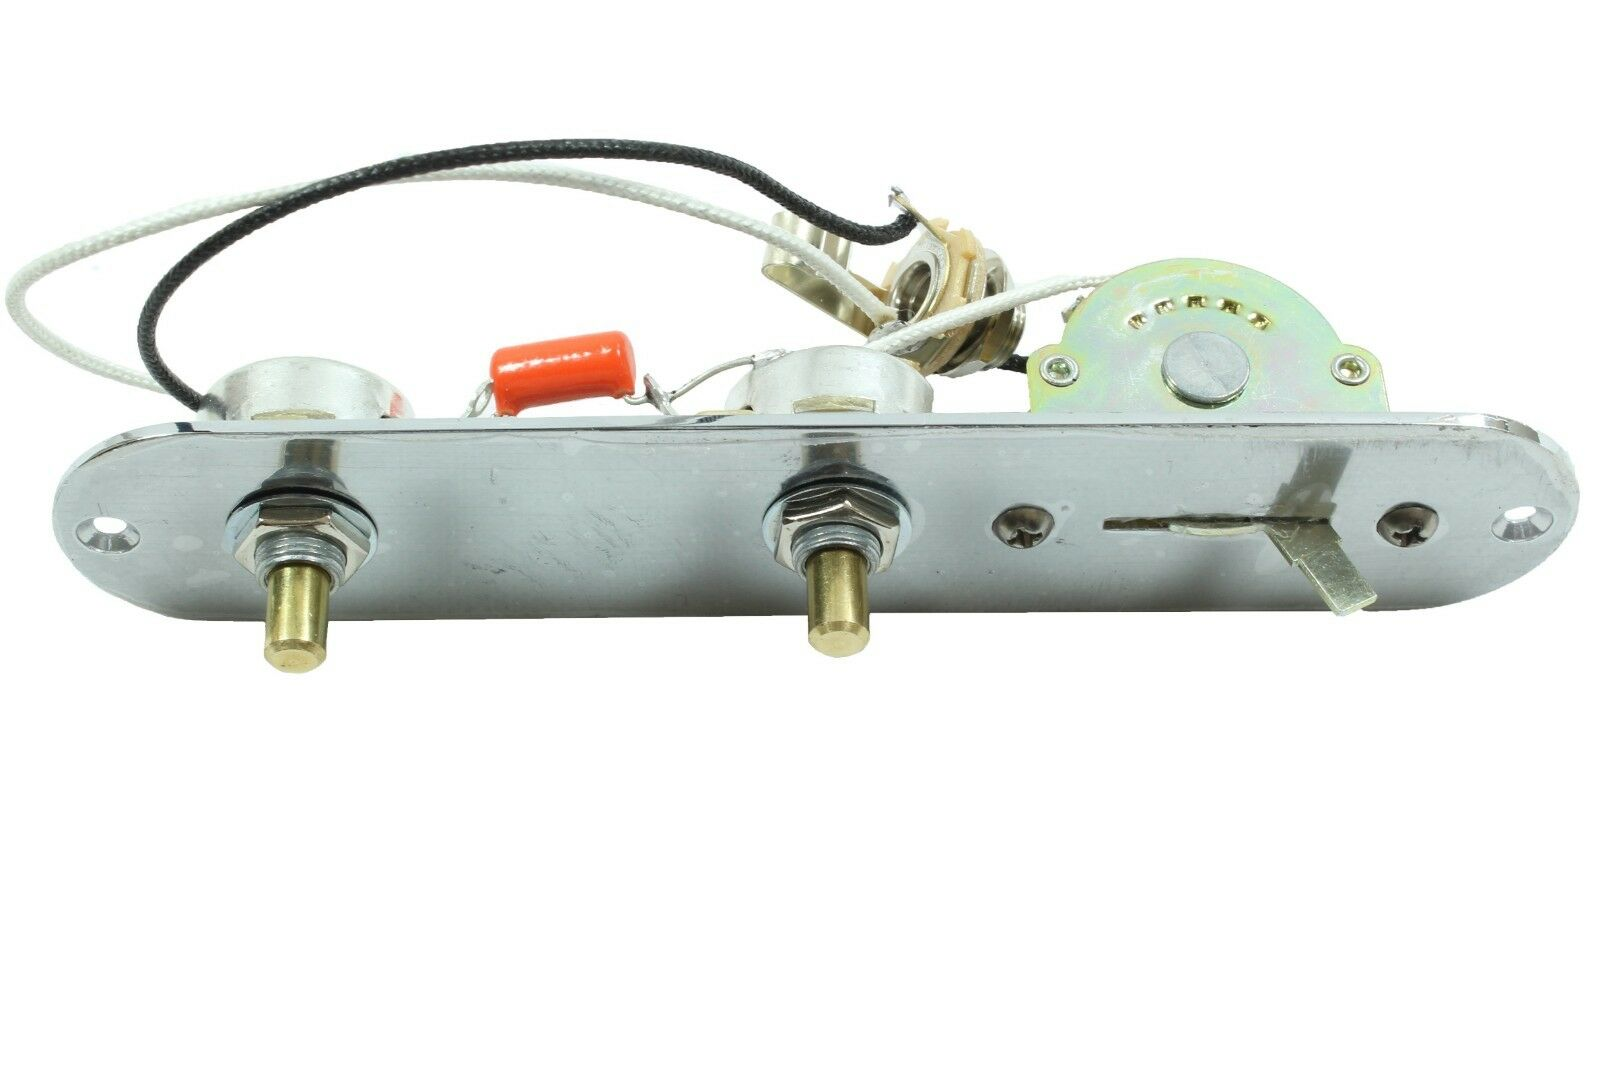 Loaded Telecaster control plate (Import Größed plate) chrome, schwarz or Gold